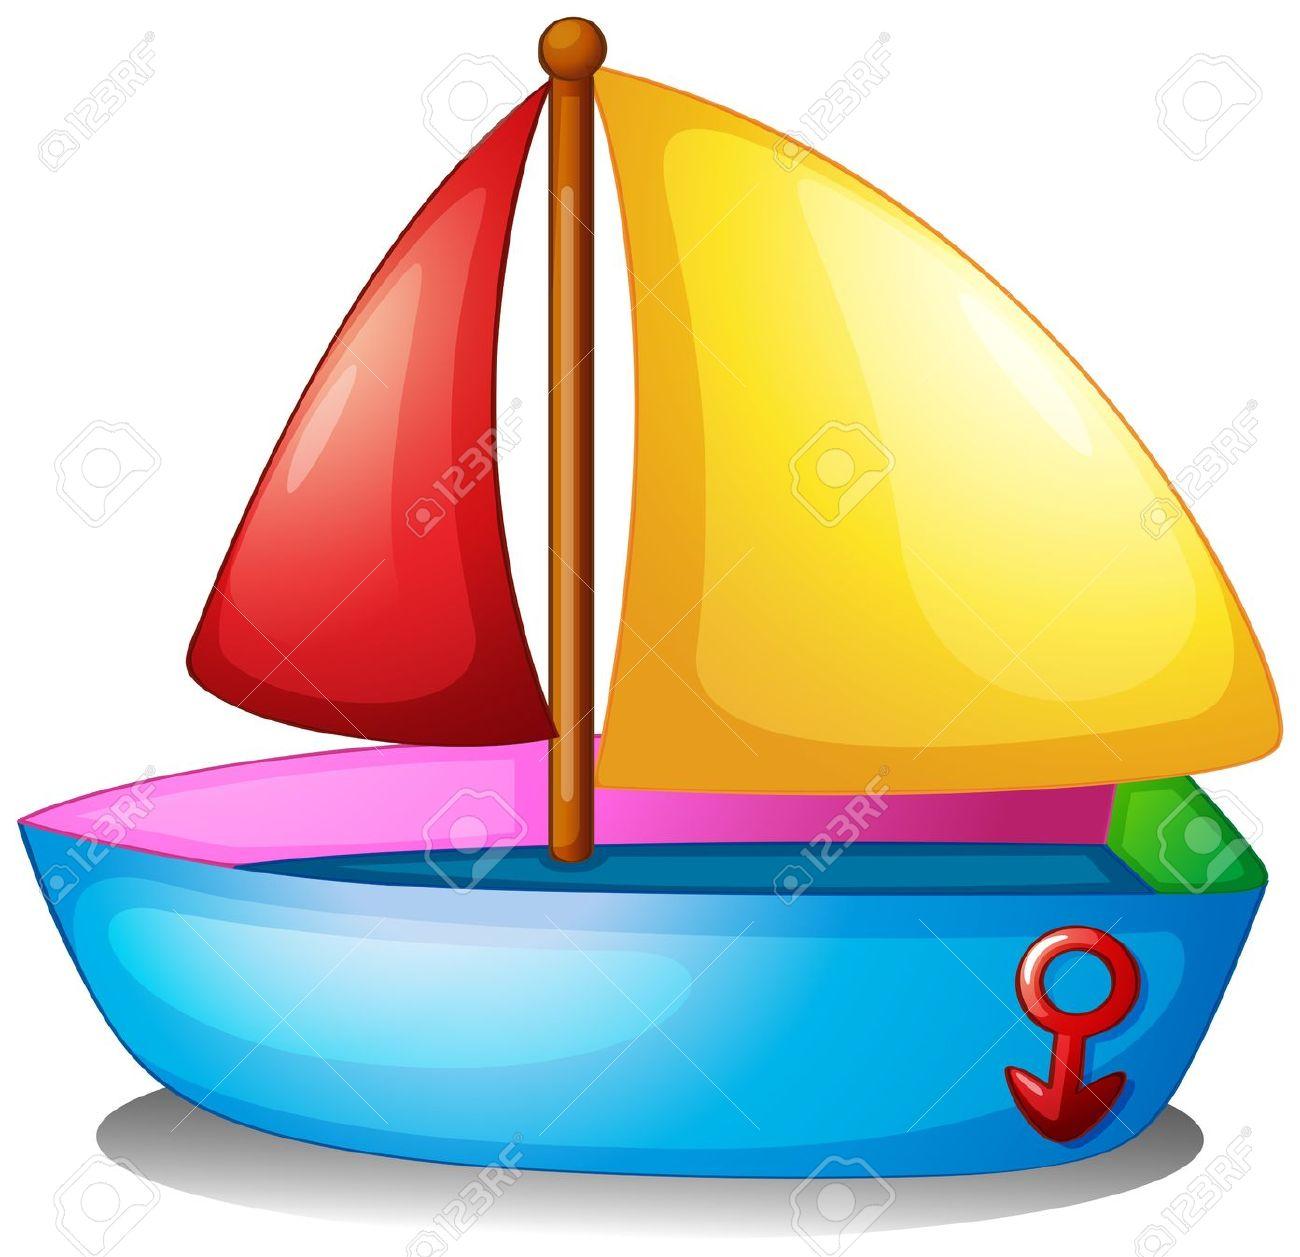 hight resolution of 1300x1257 sailboat clip art